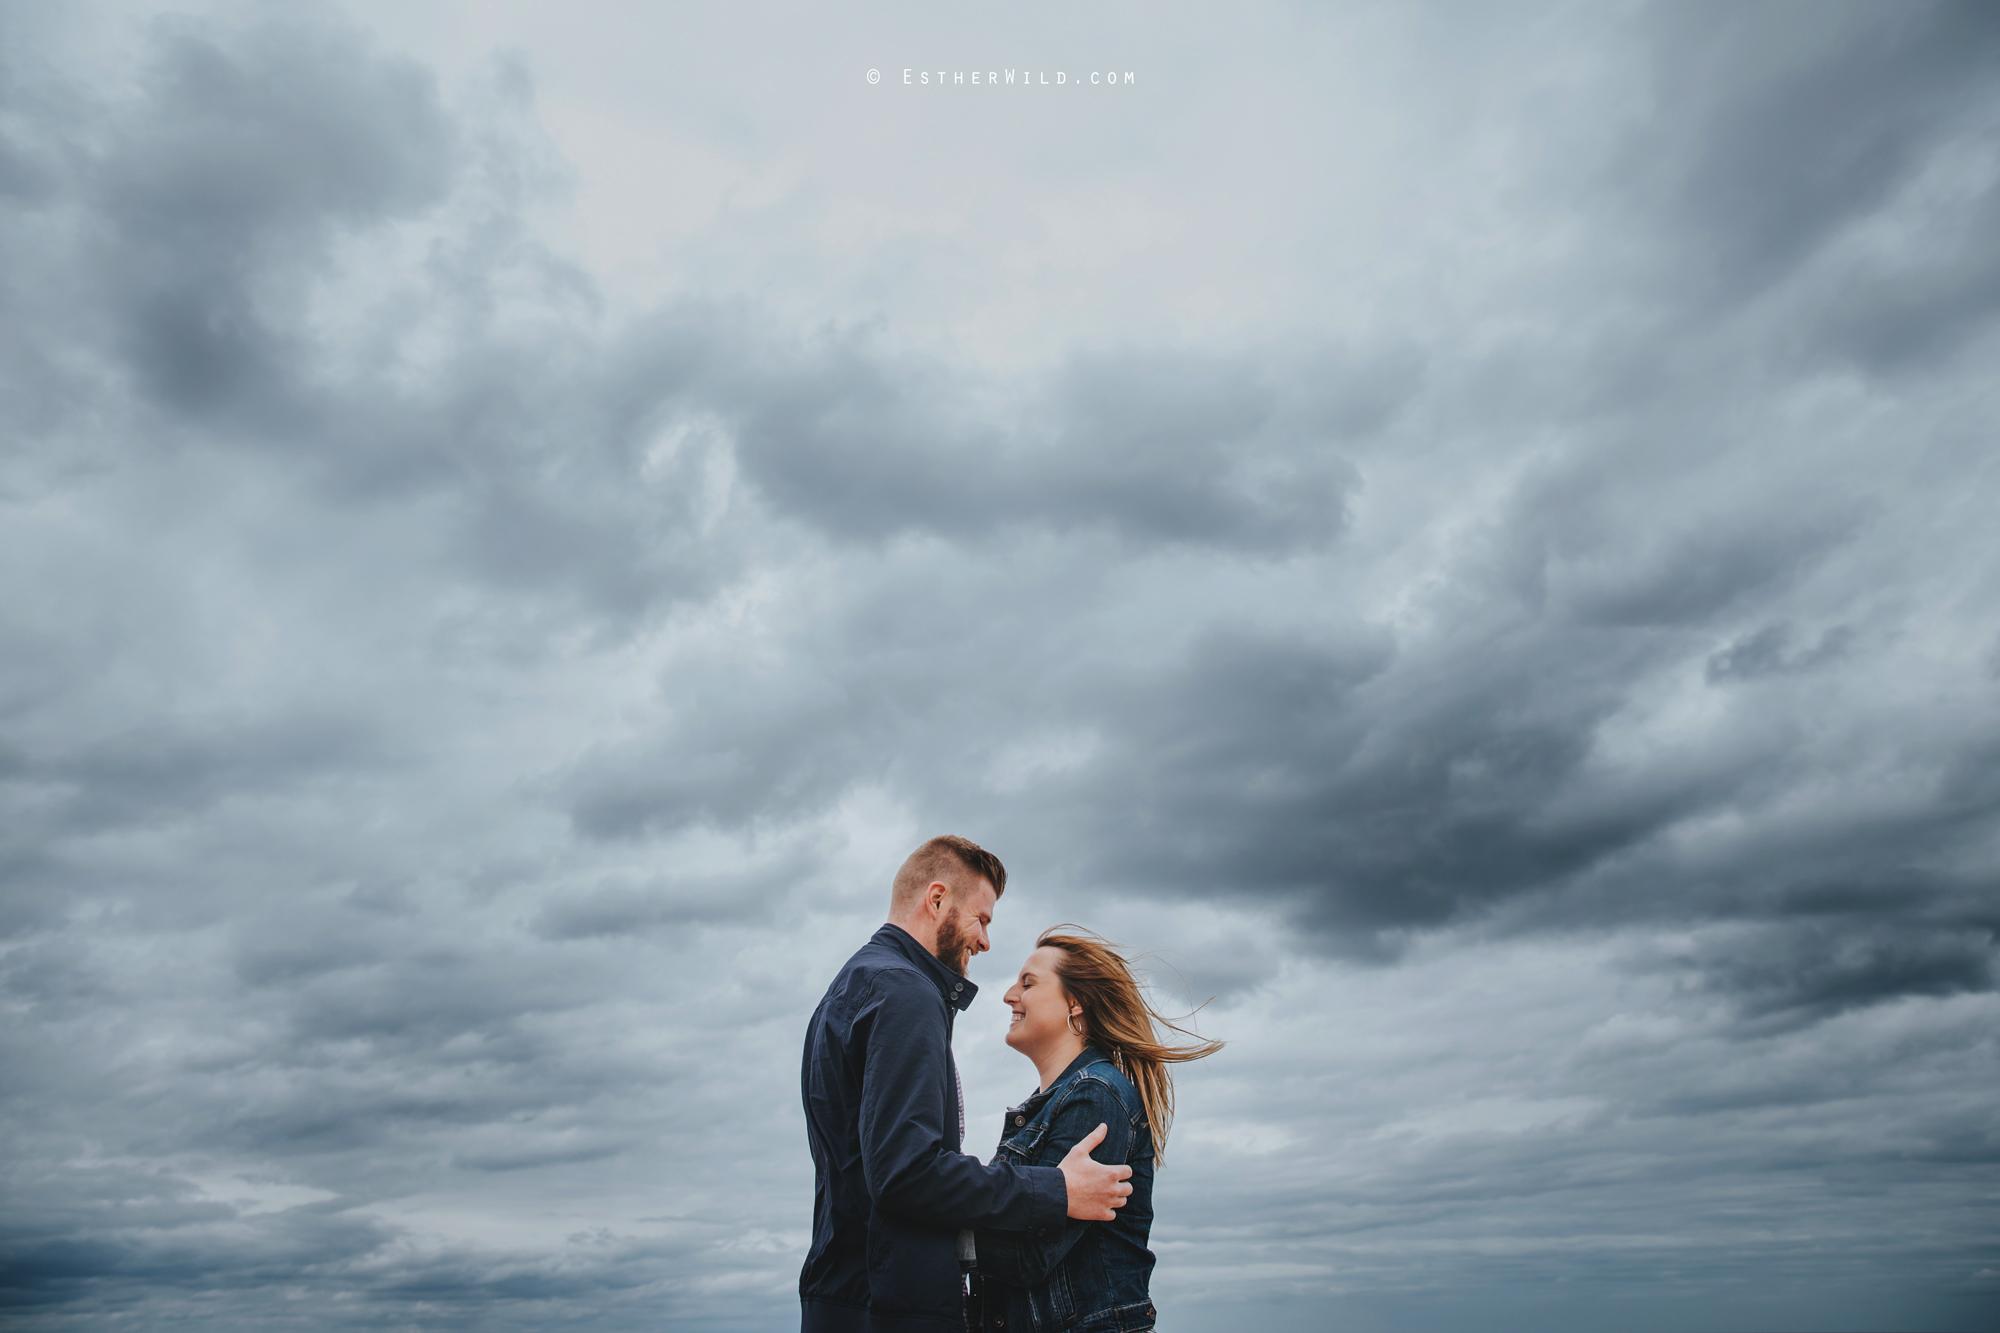 Brancaster_Photo_Session_Engagement_Love_Pre-Wedding_IMG_2684.jpg